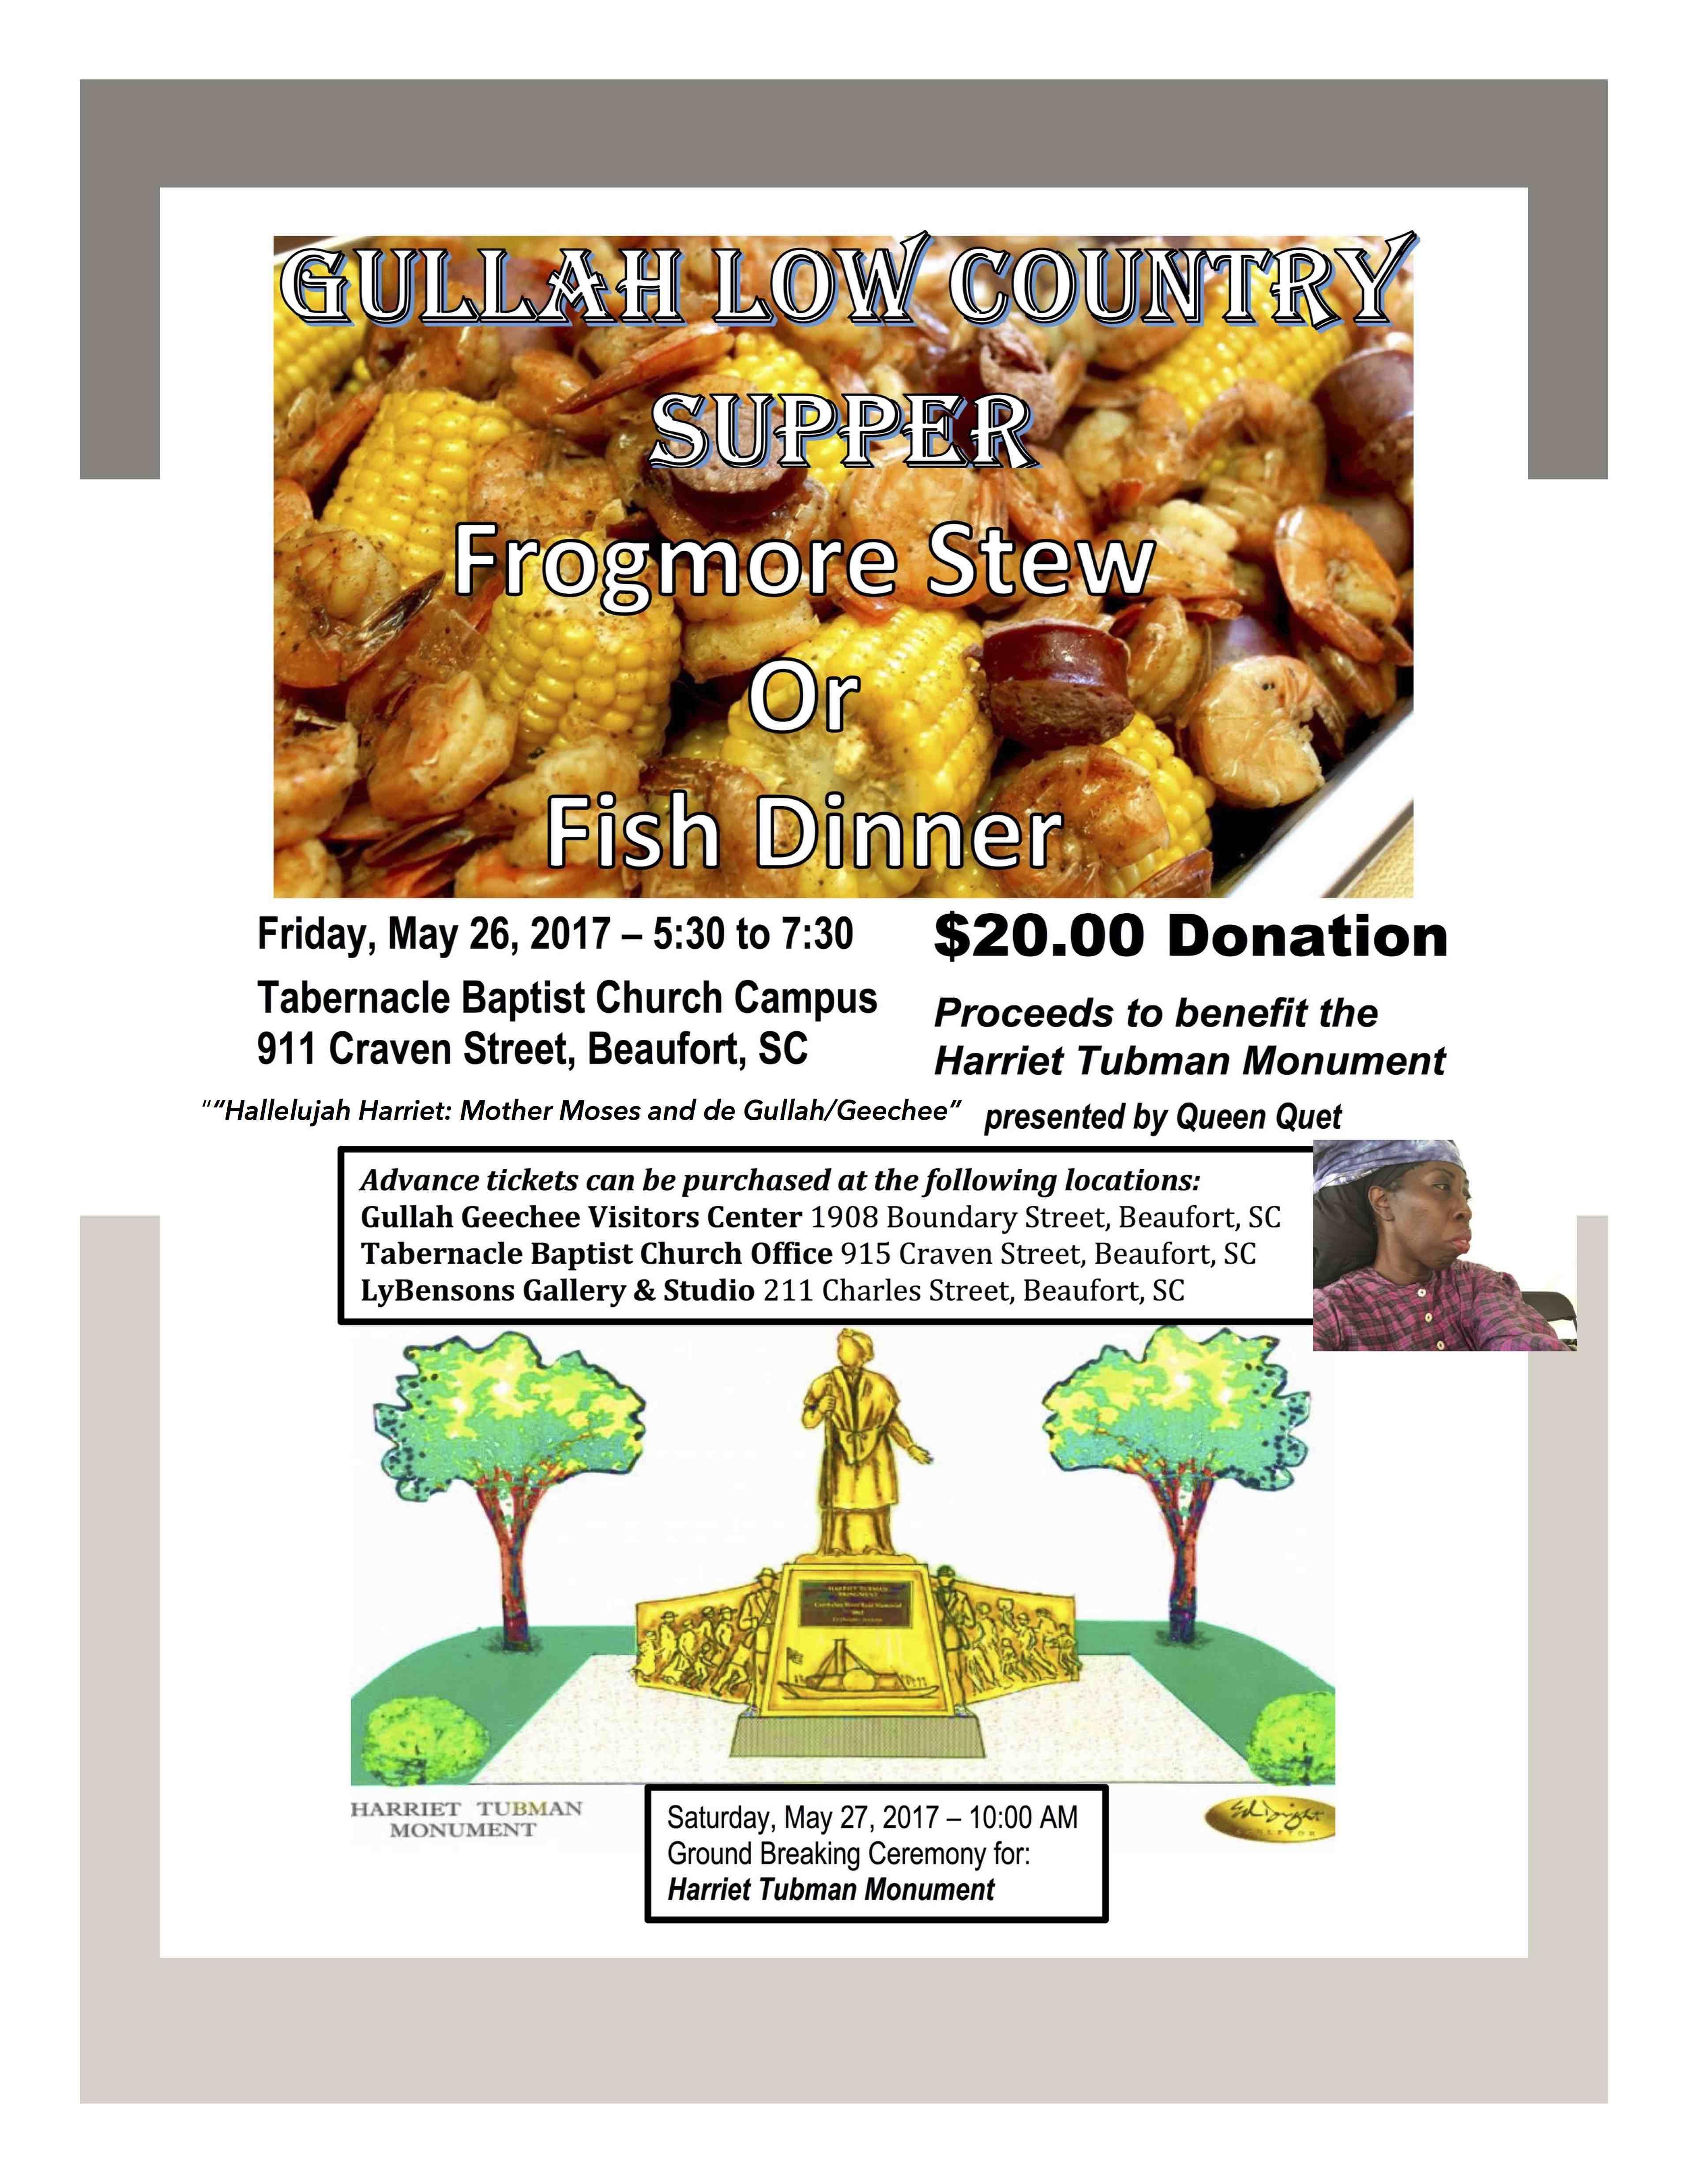 Gullah Lowcountry Dinner Theater